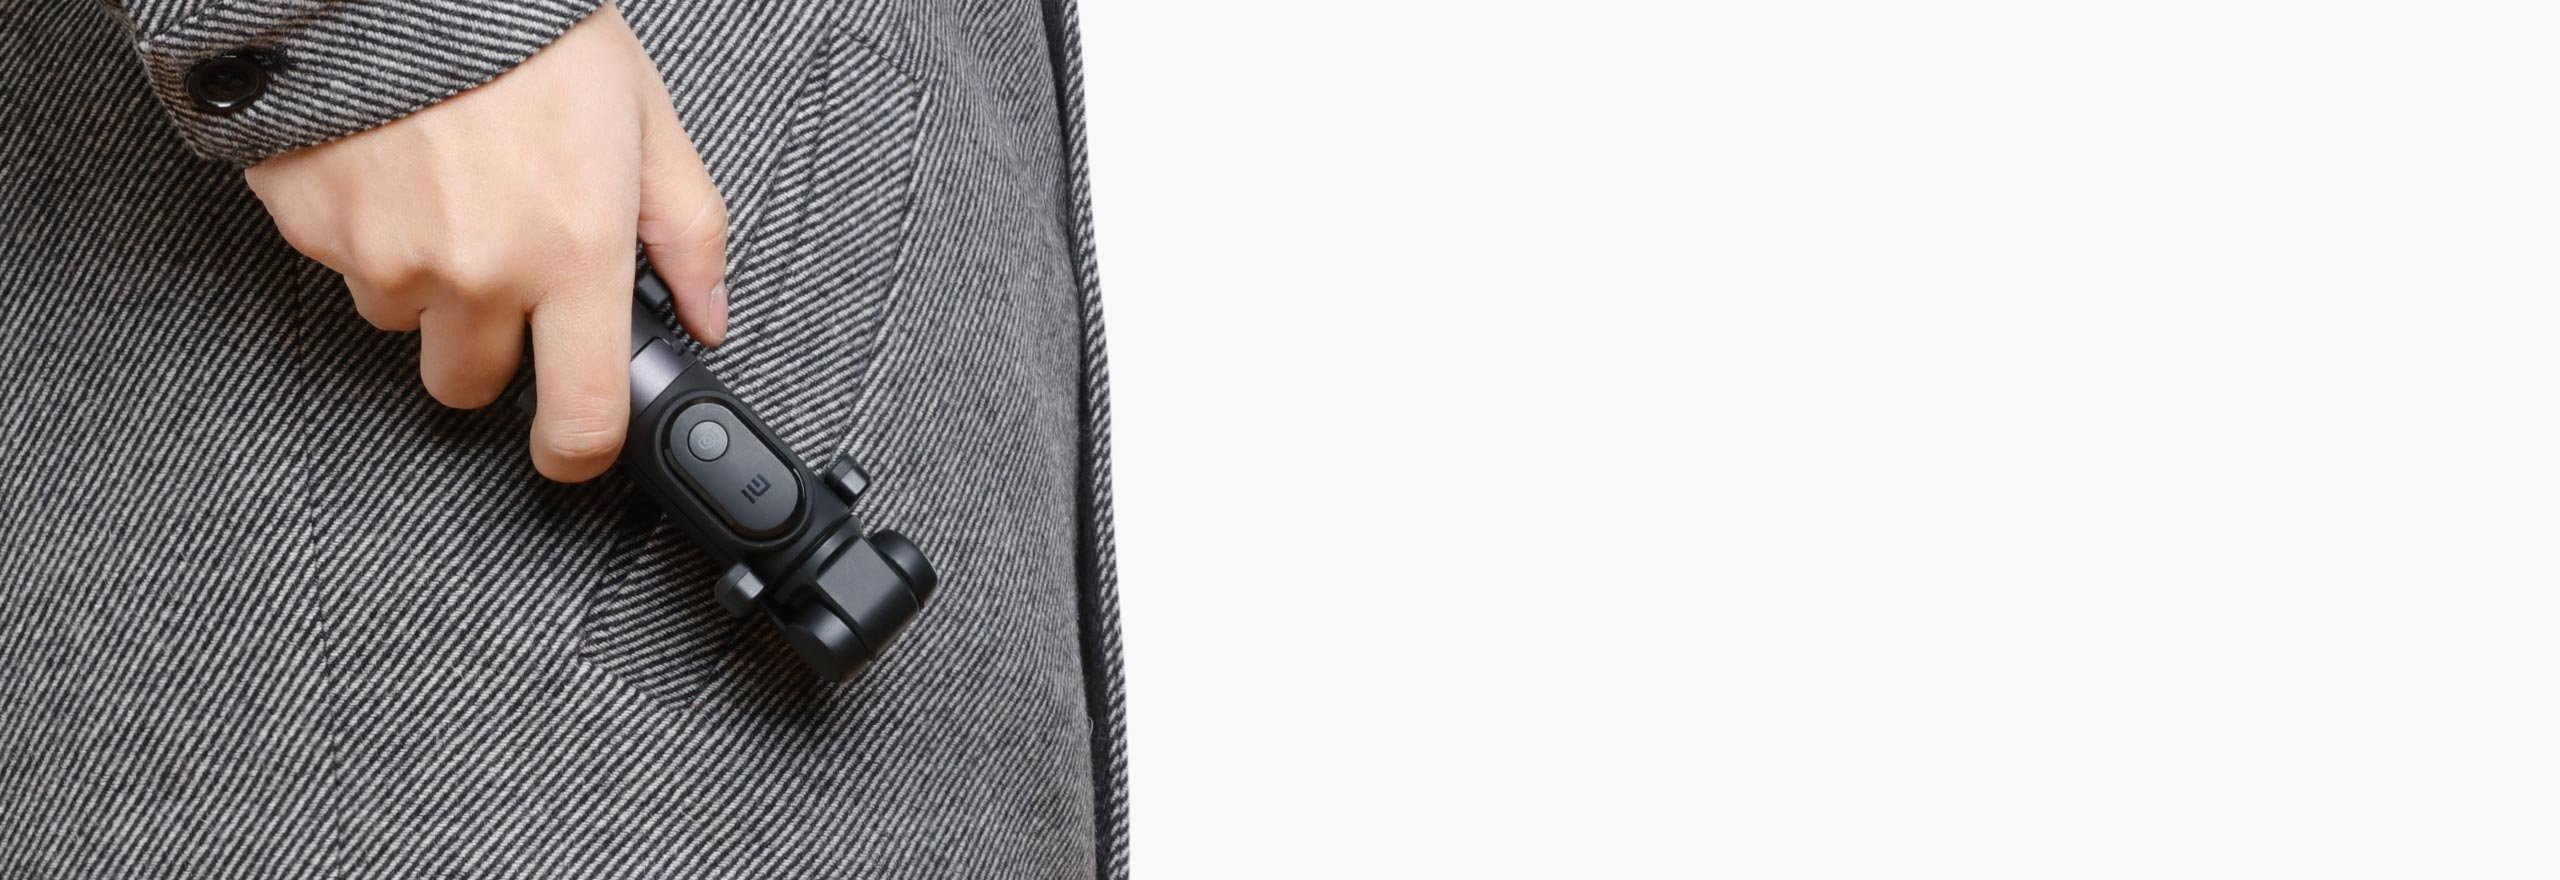 /Bluetooth 3.0/ Palo Selfie Xiaomi Selfie Stick Tripod Black/ /Funci/ã n Tr/Ãpode /Aluminio/